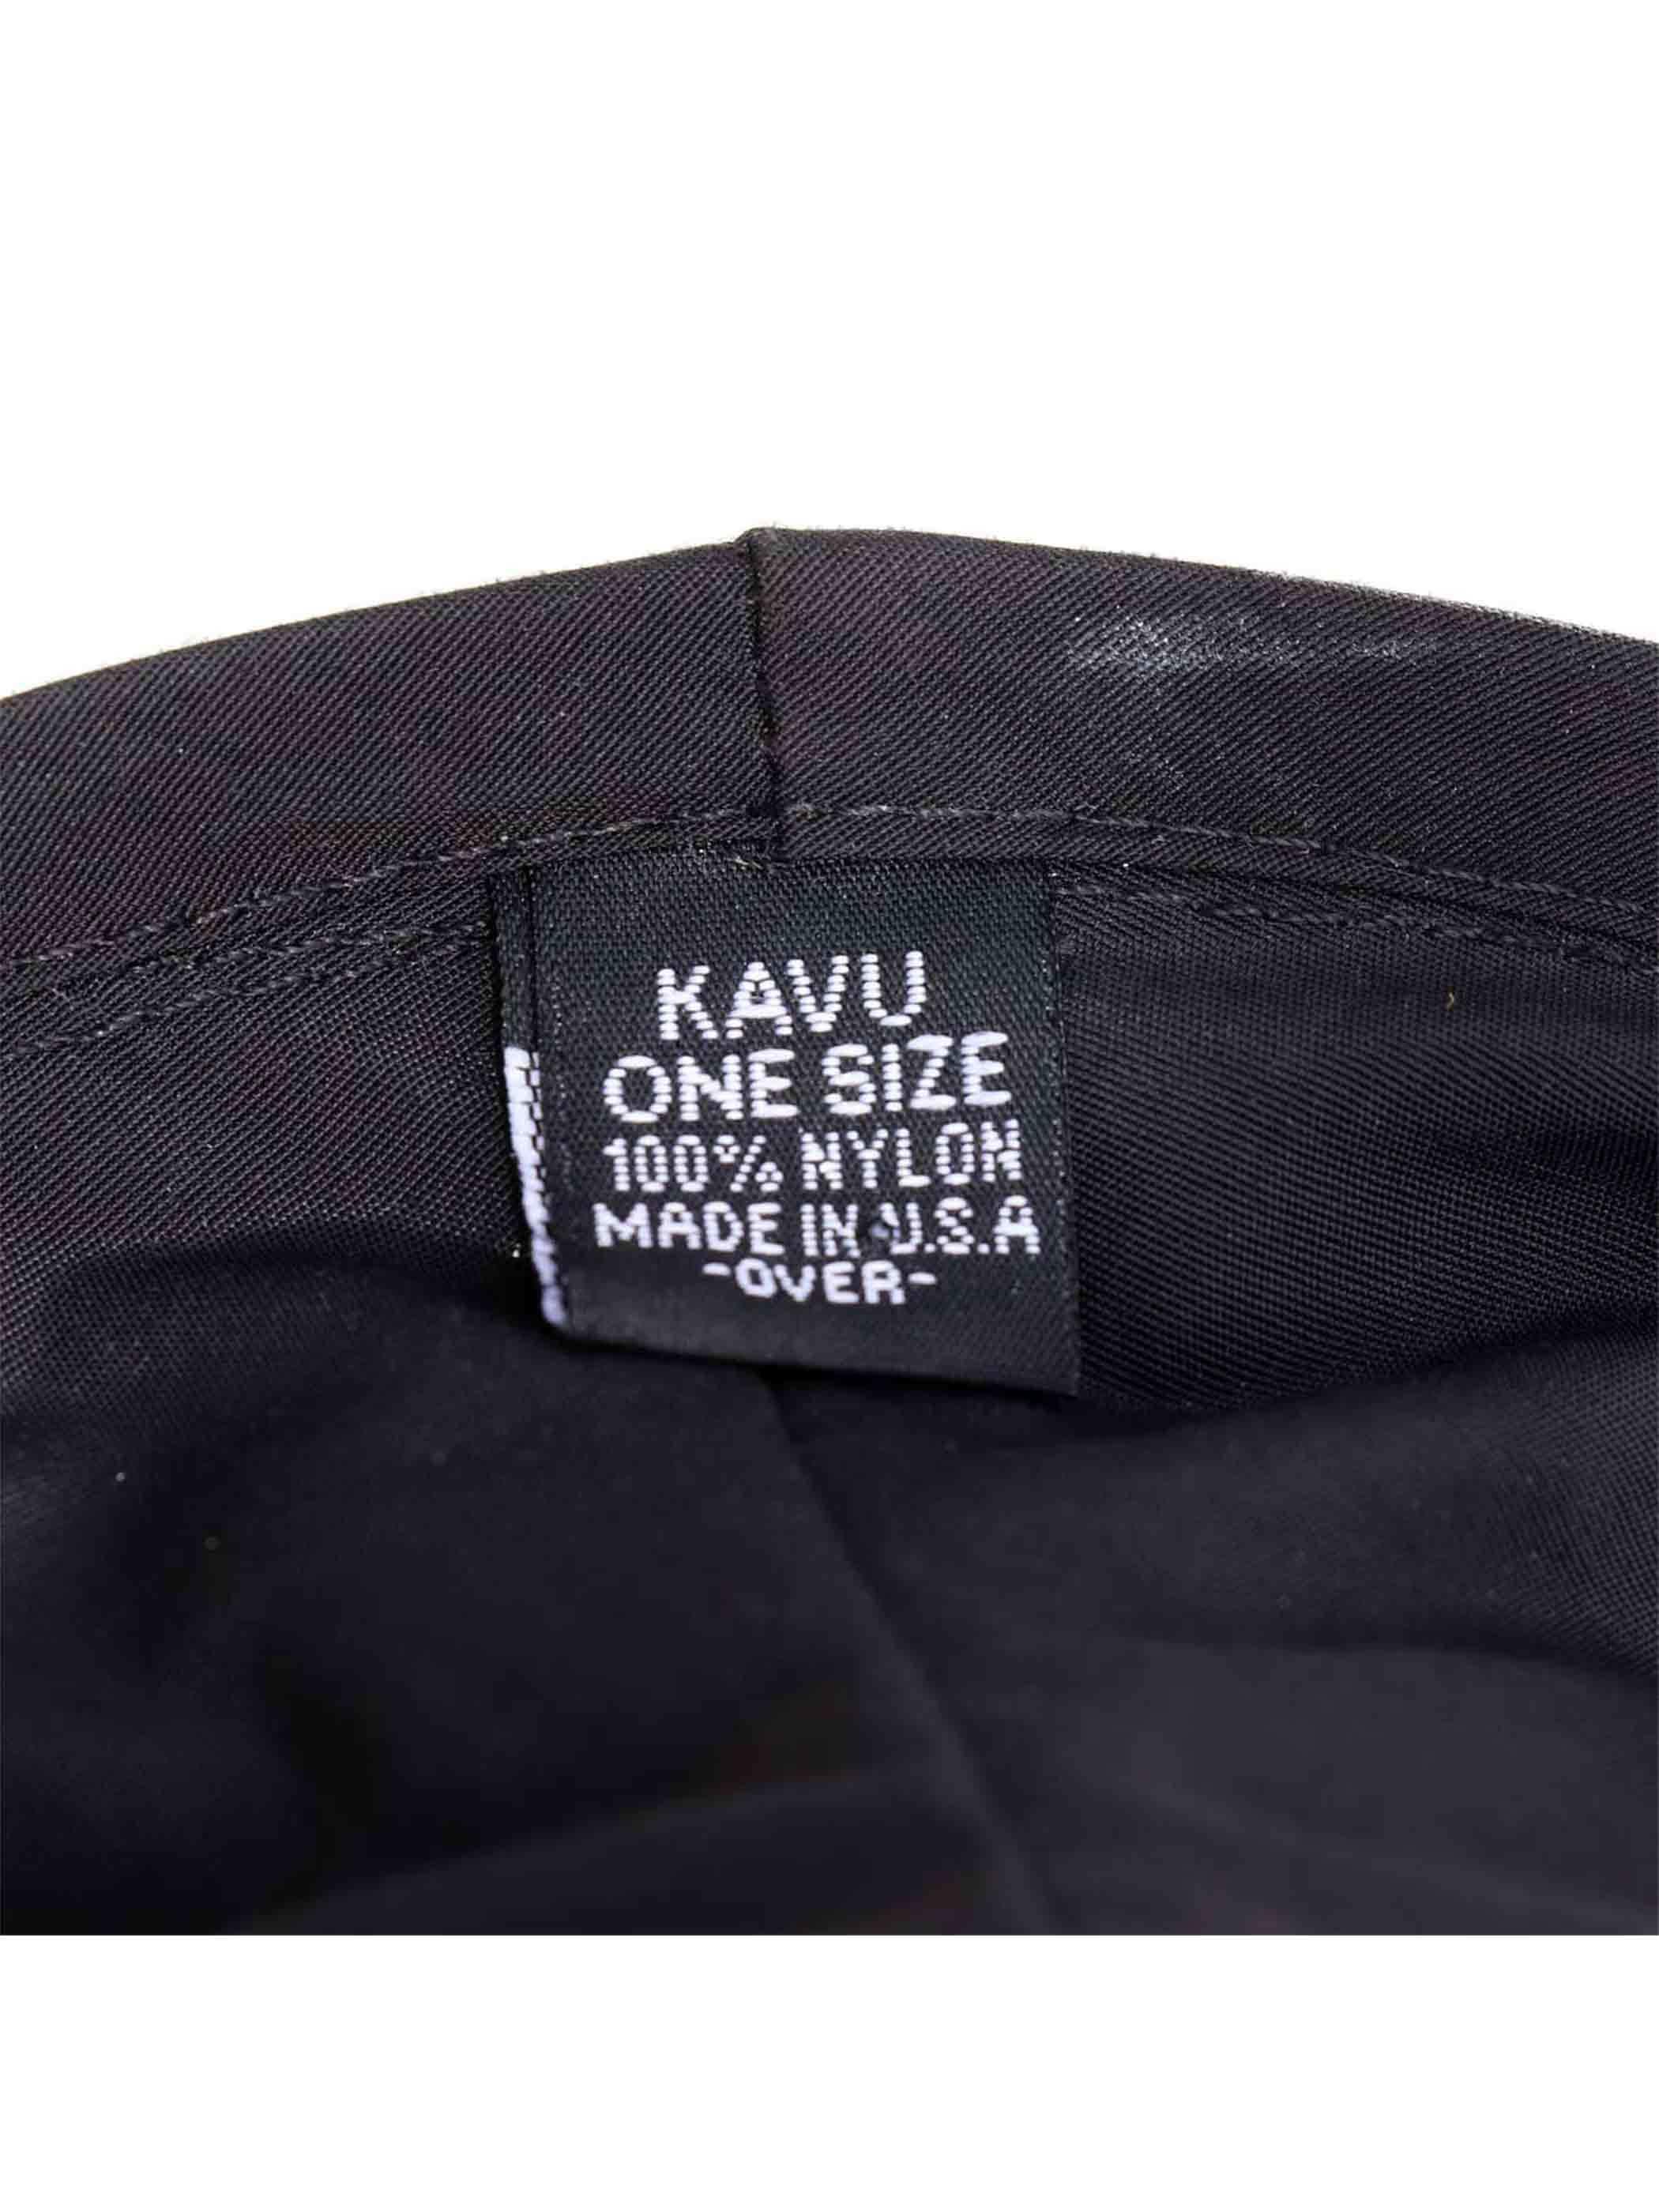 00's KAVU USA製 フィッシャーマンチルバ サンハット [FREE]